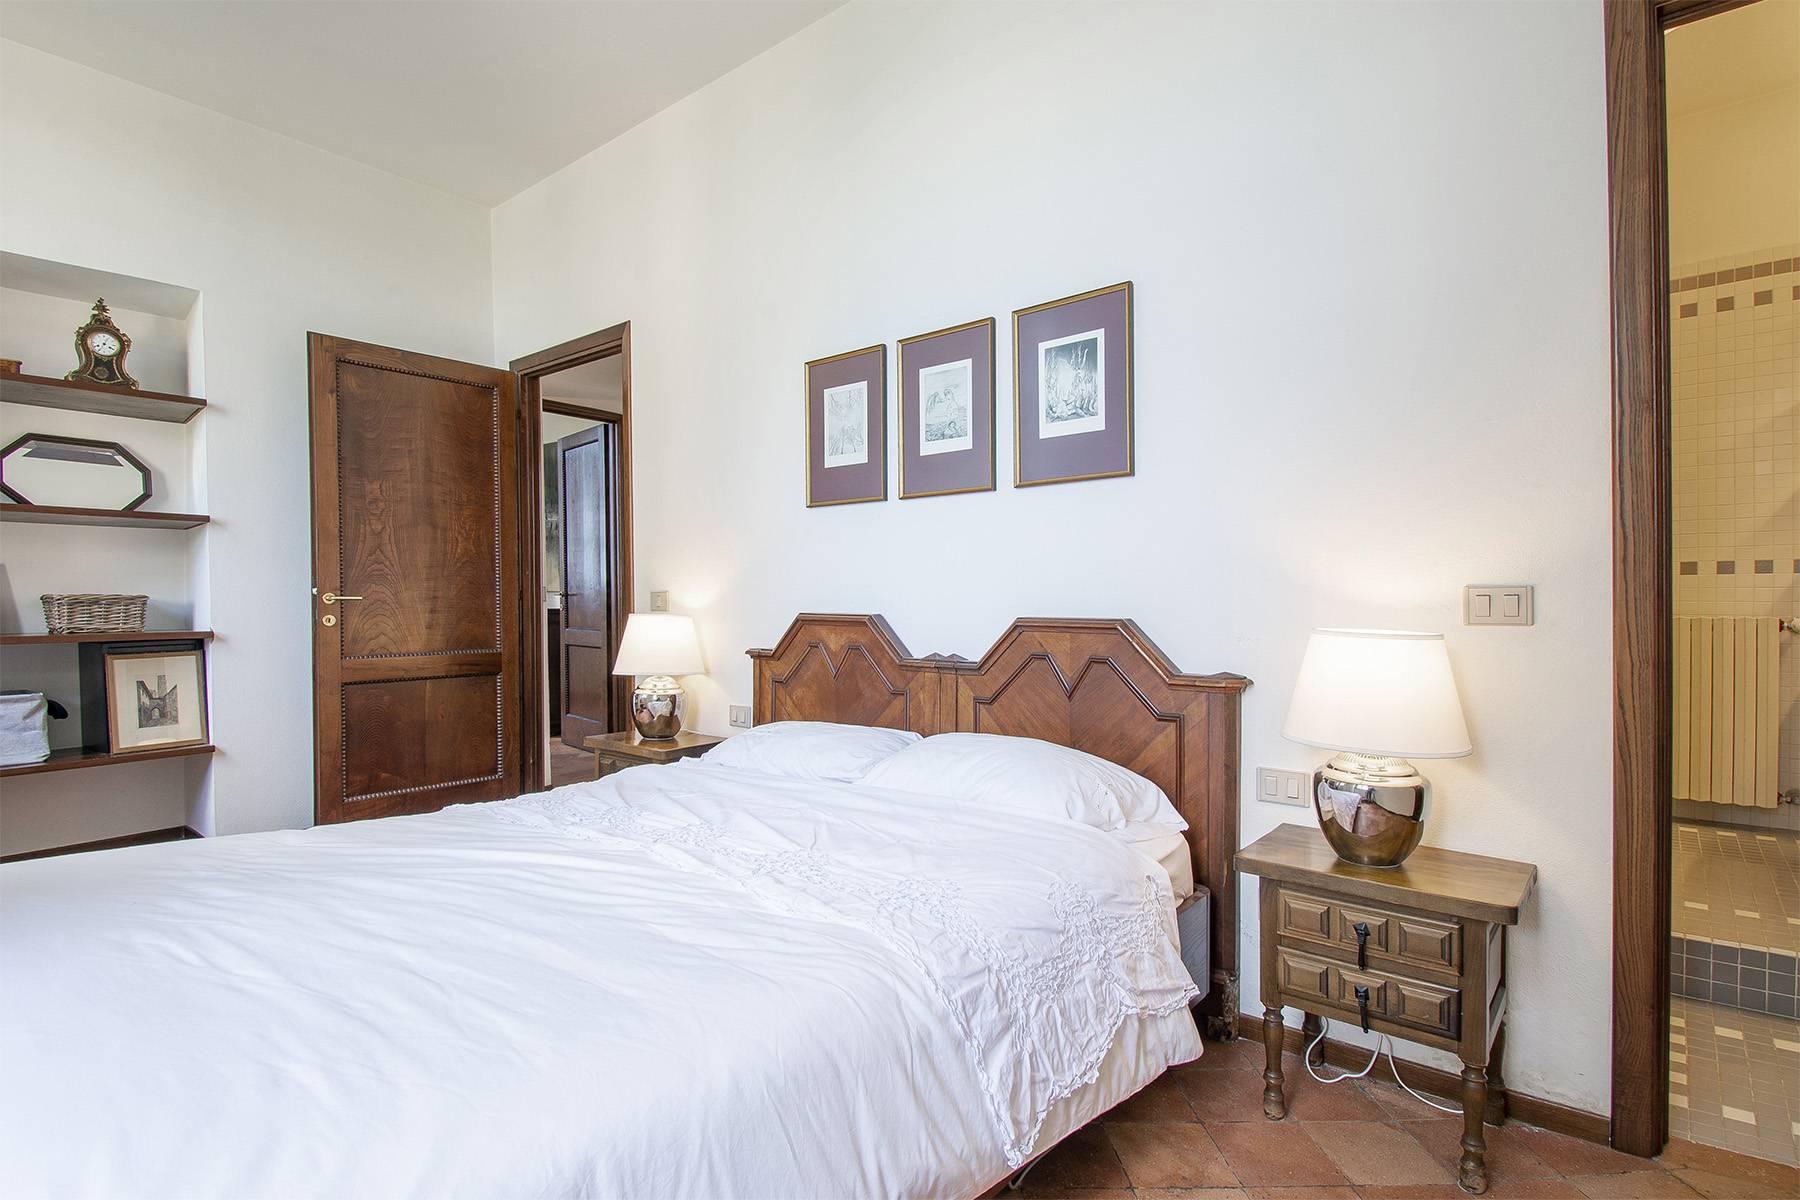 Villa in Vendita a Capannori: 5 locali, 380 mq - Foto 19